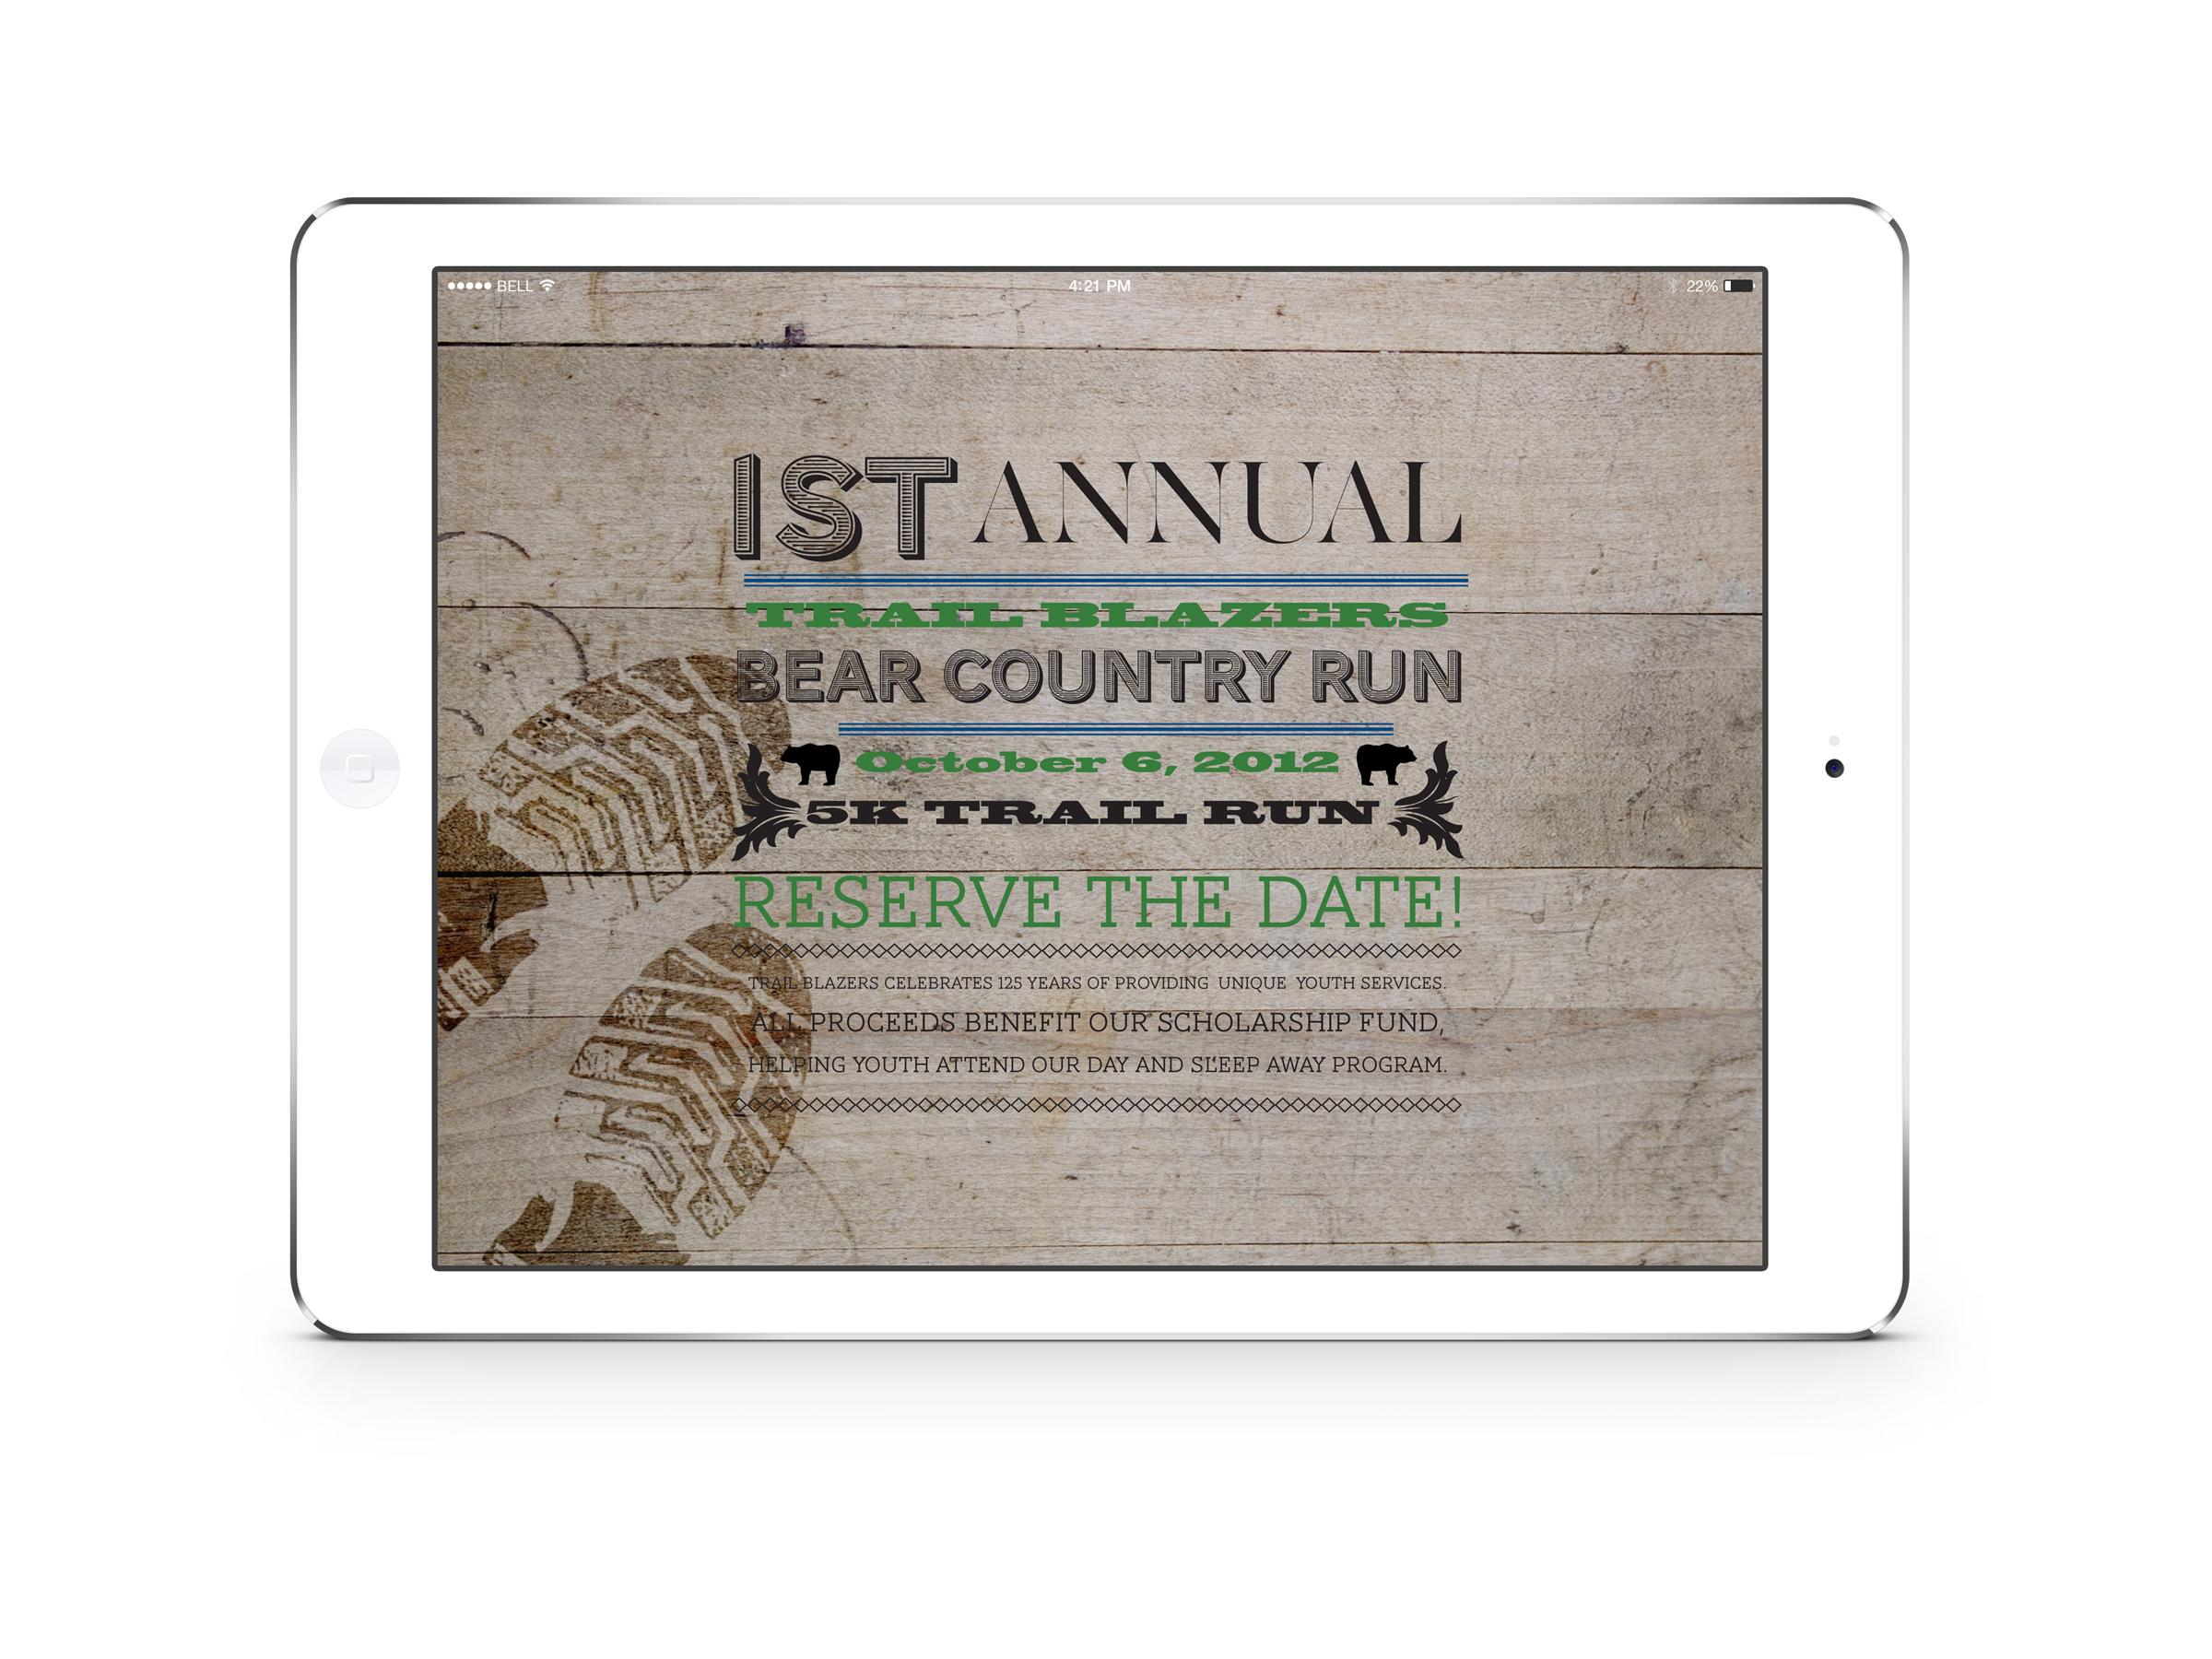 BearRun_WEB Advert.jpg